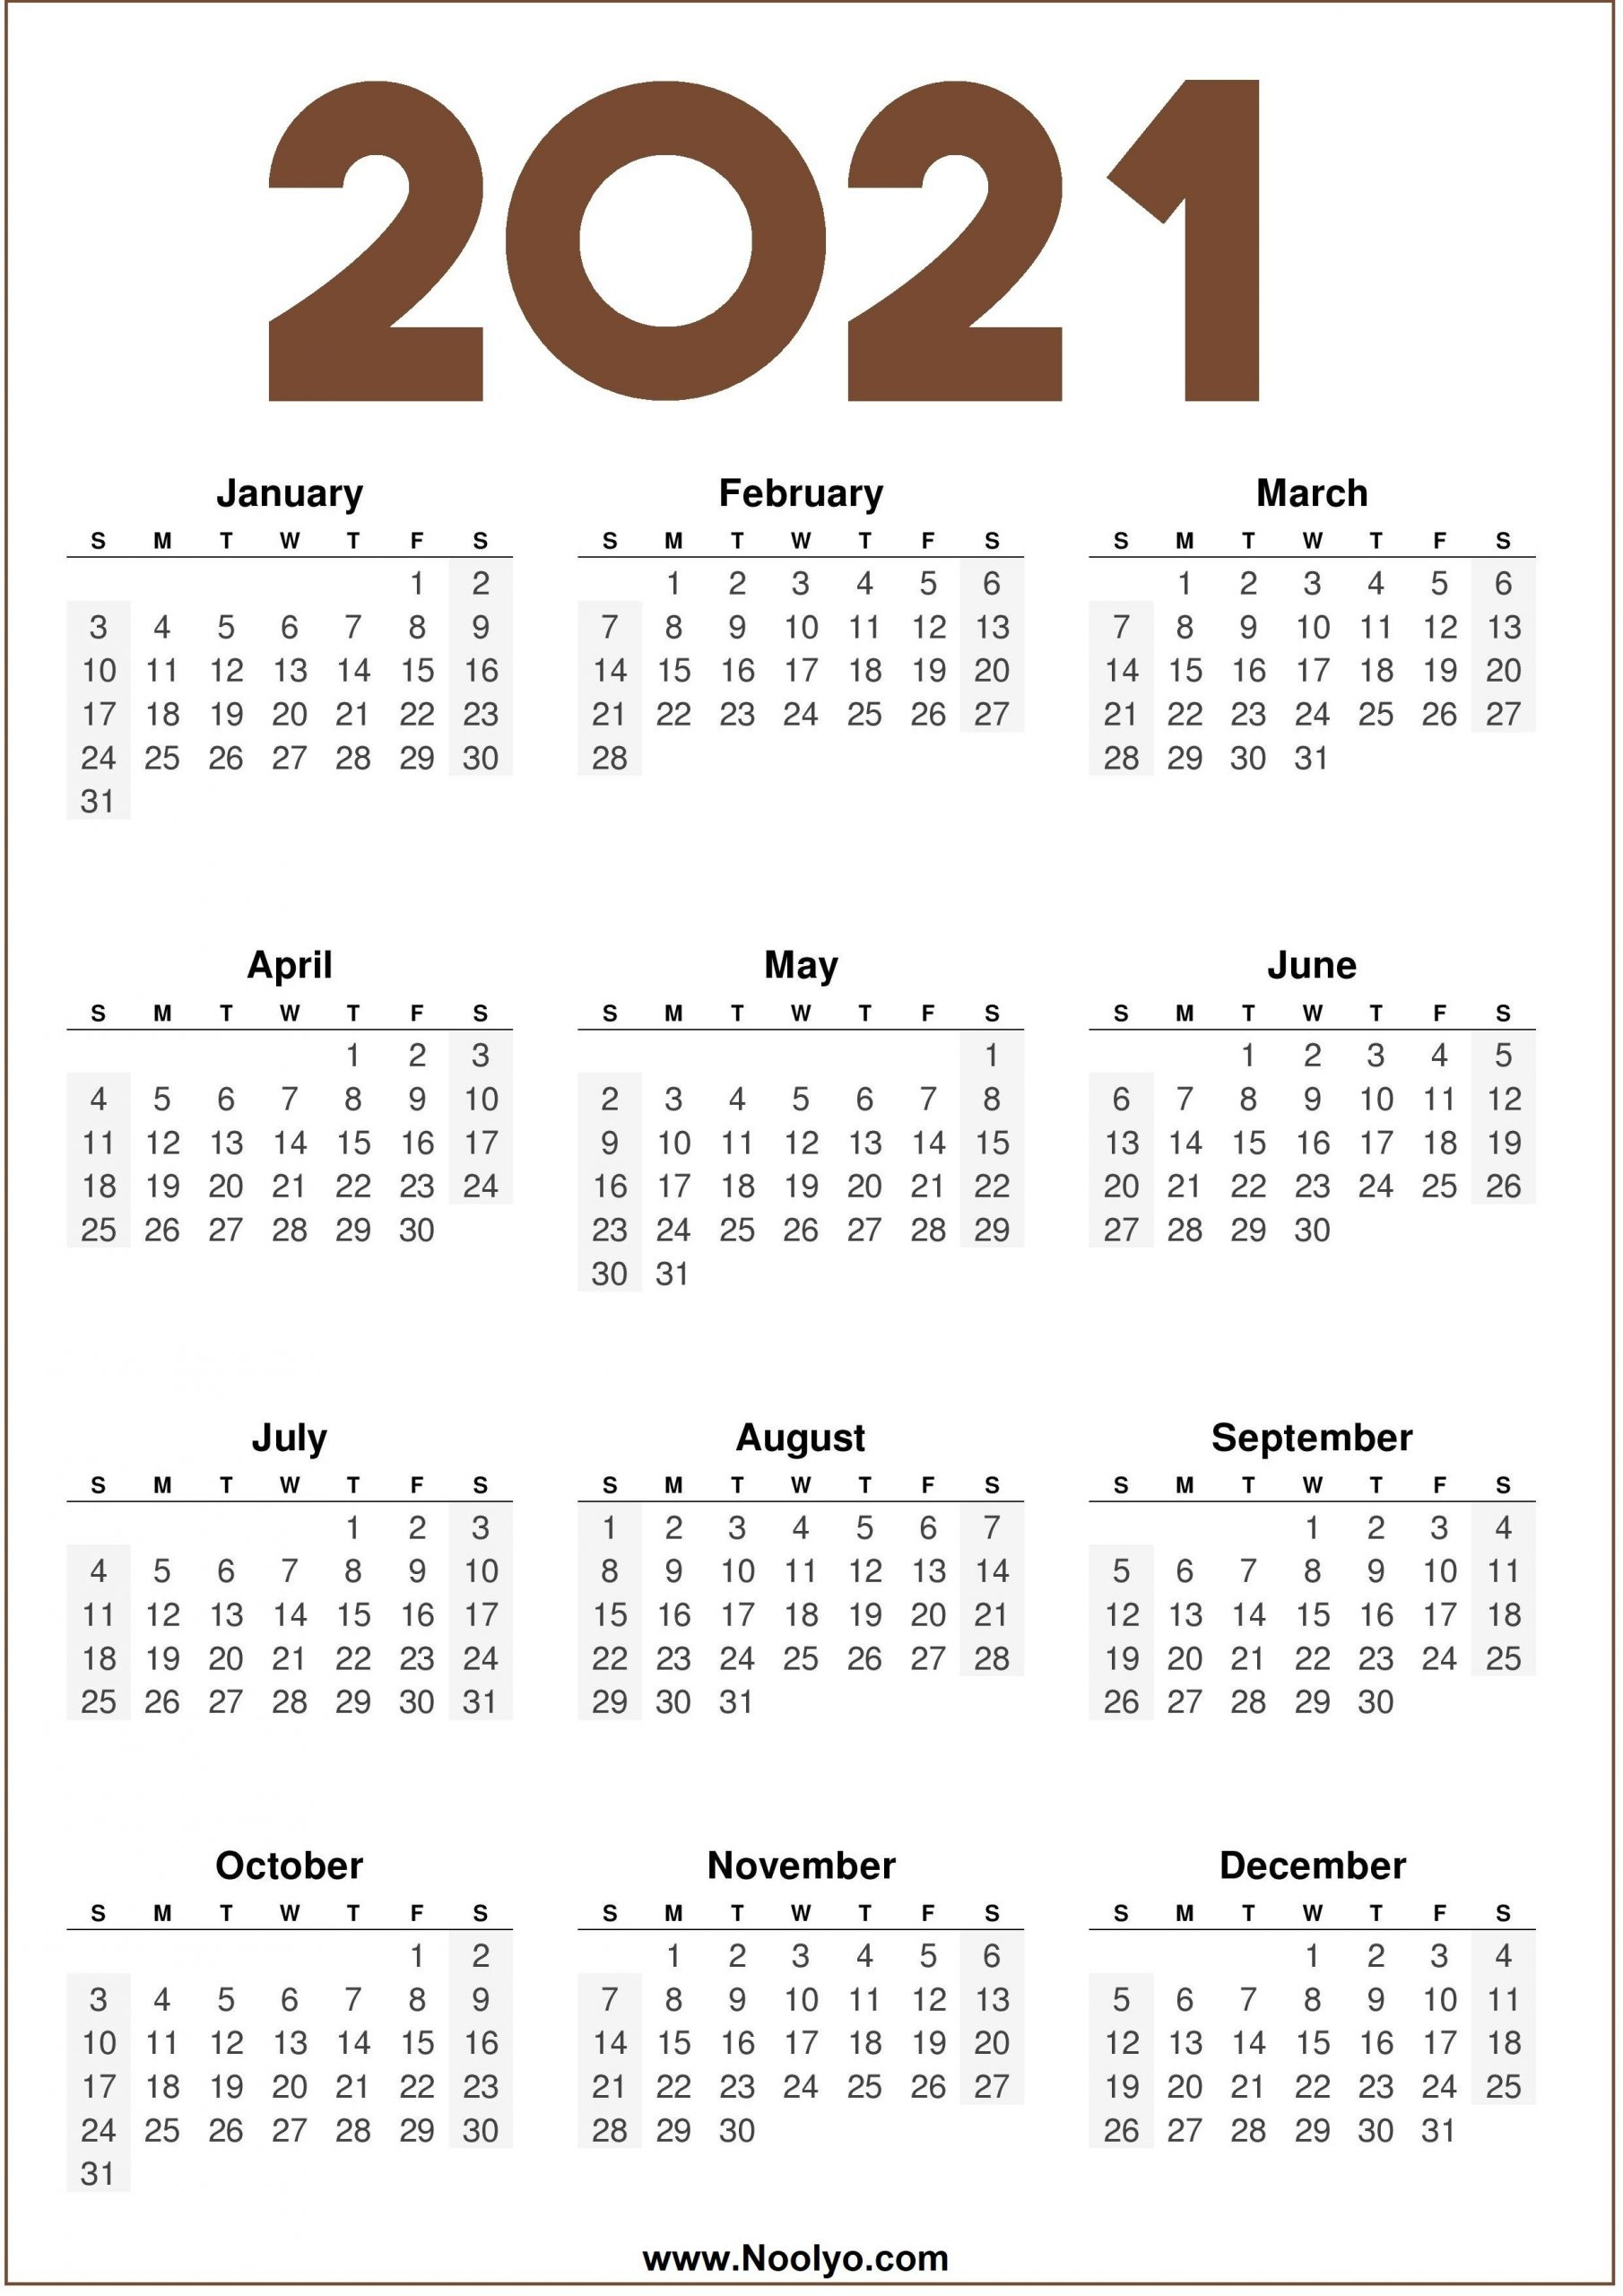 2021 calendar one page printable noolyo